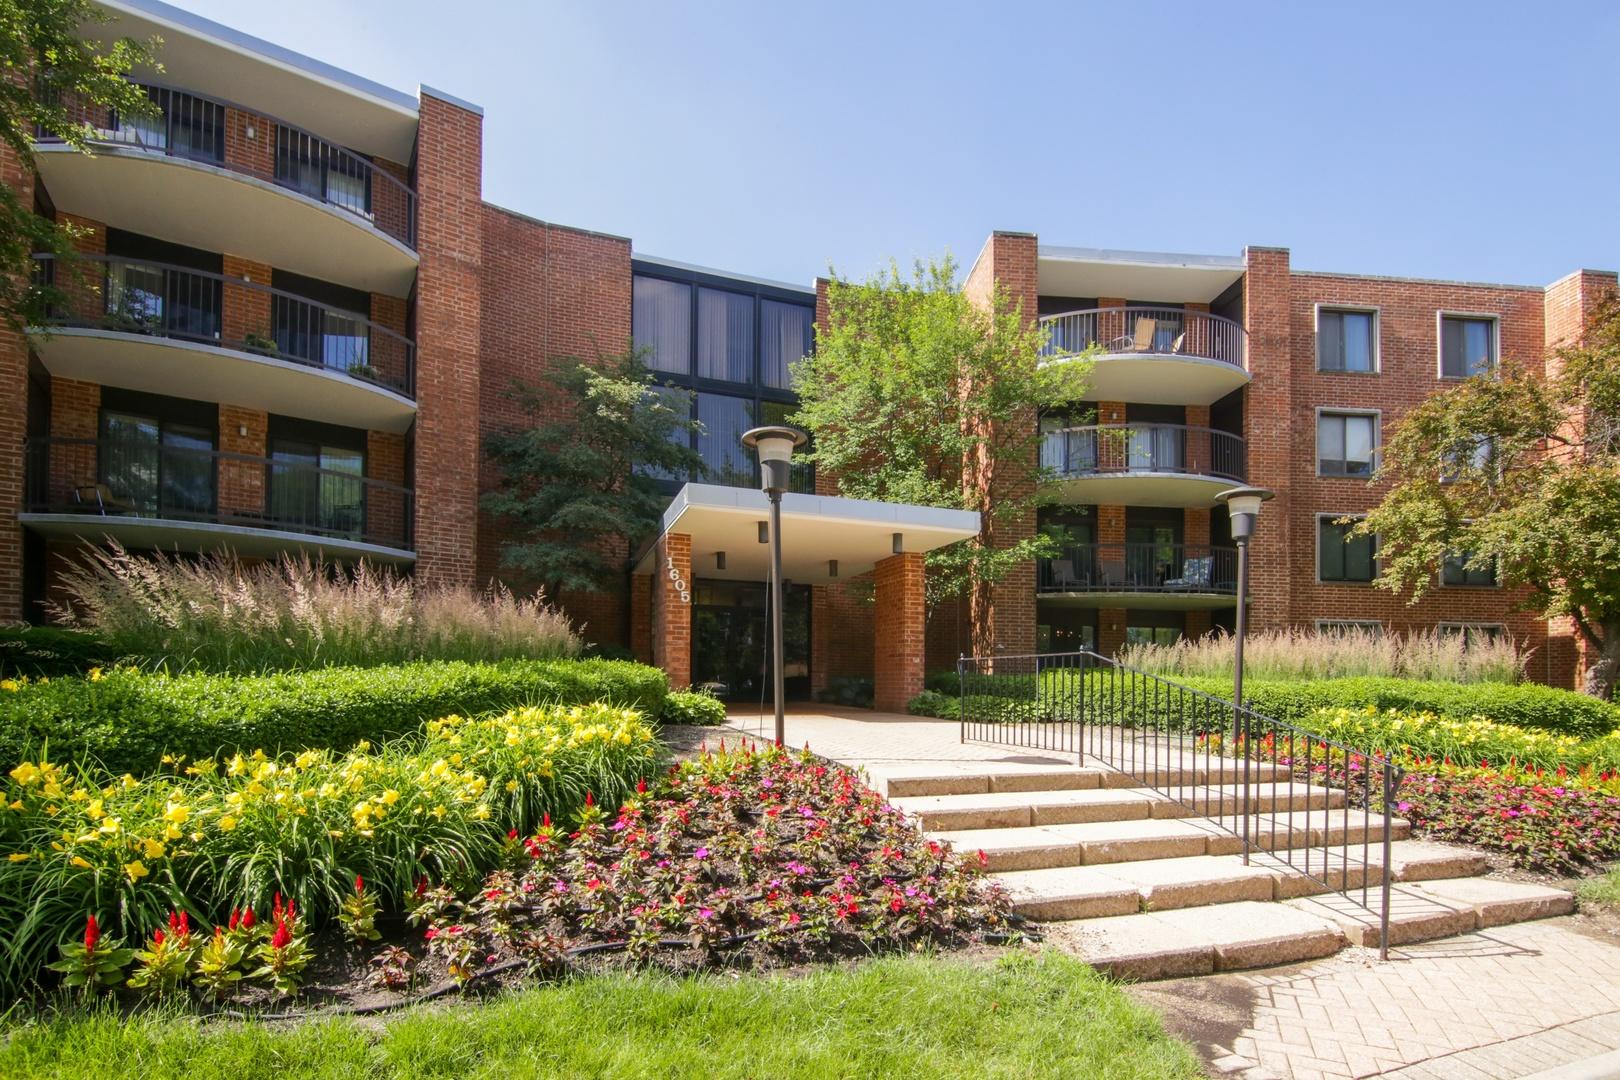 1605 East Central Road, Unit 216b, Arlington Heights, Illinois 60005